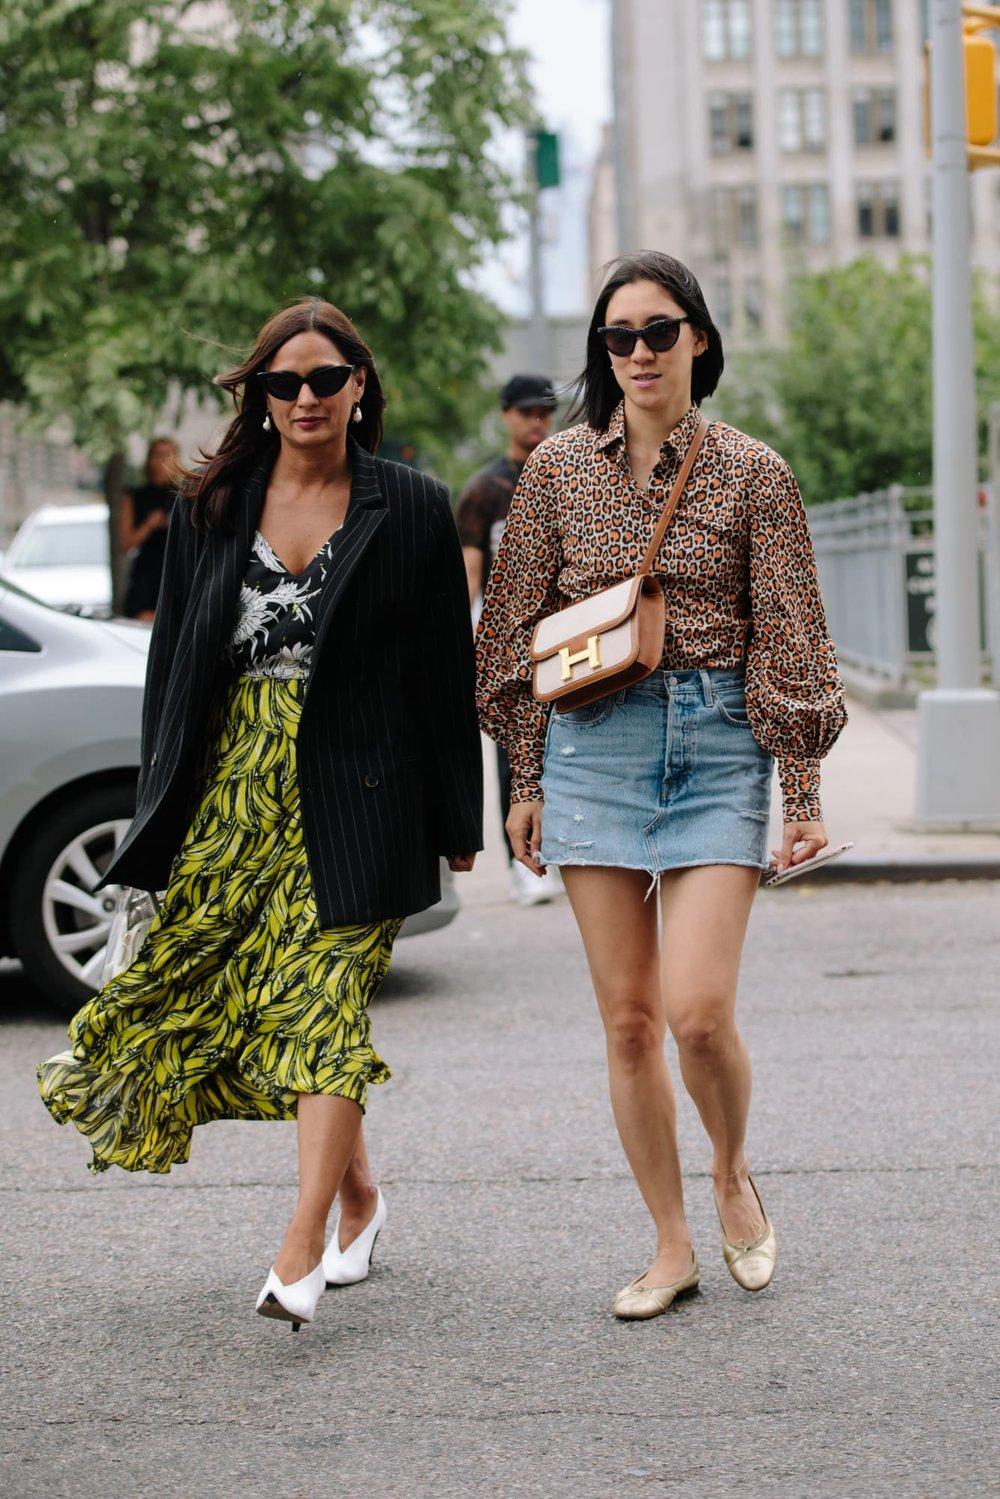 new-york-fashion-week-street-style-spring-2019-day-3-2.jpg